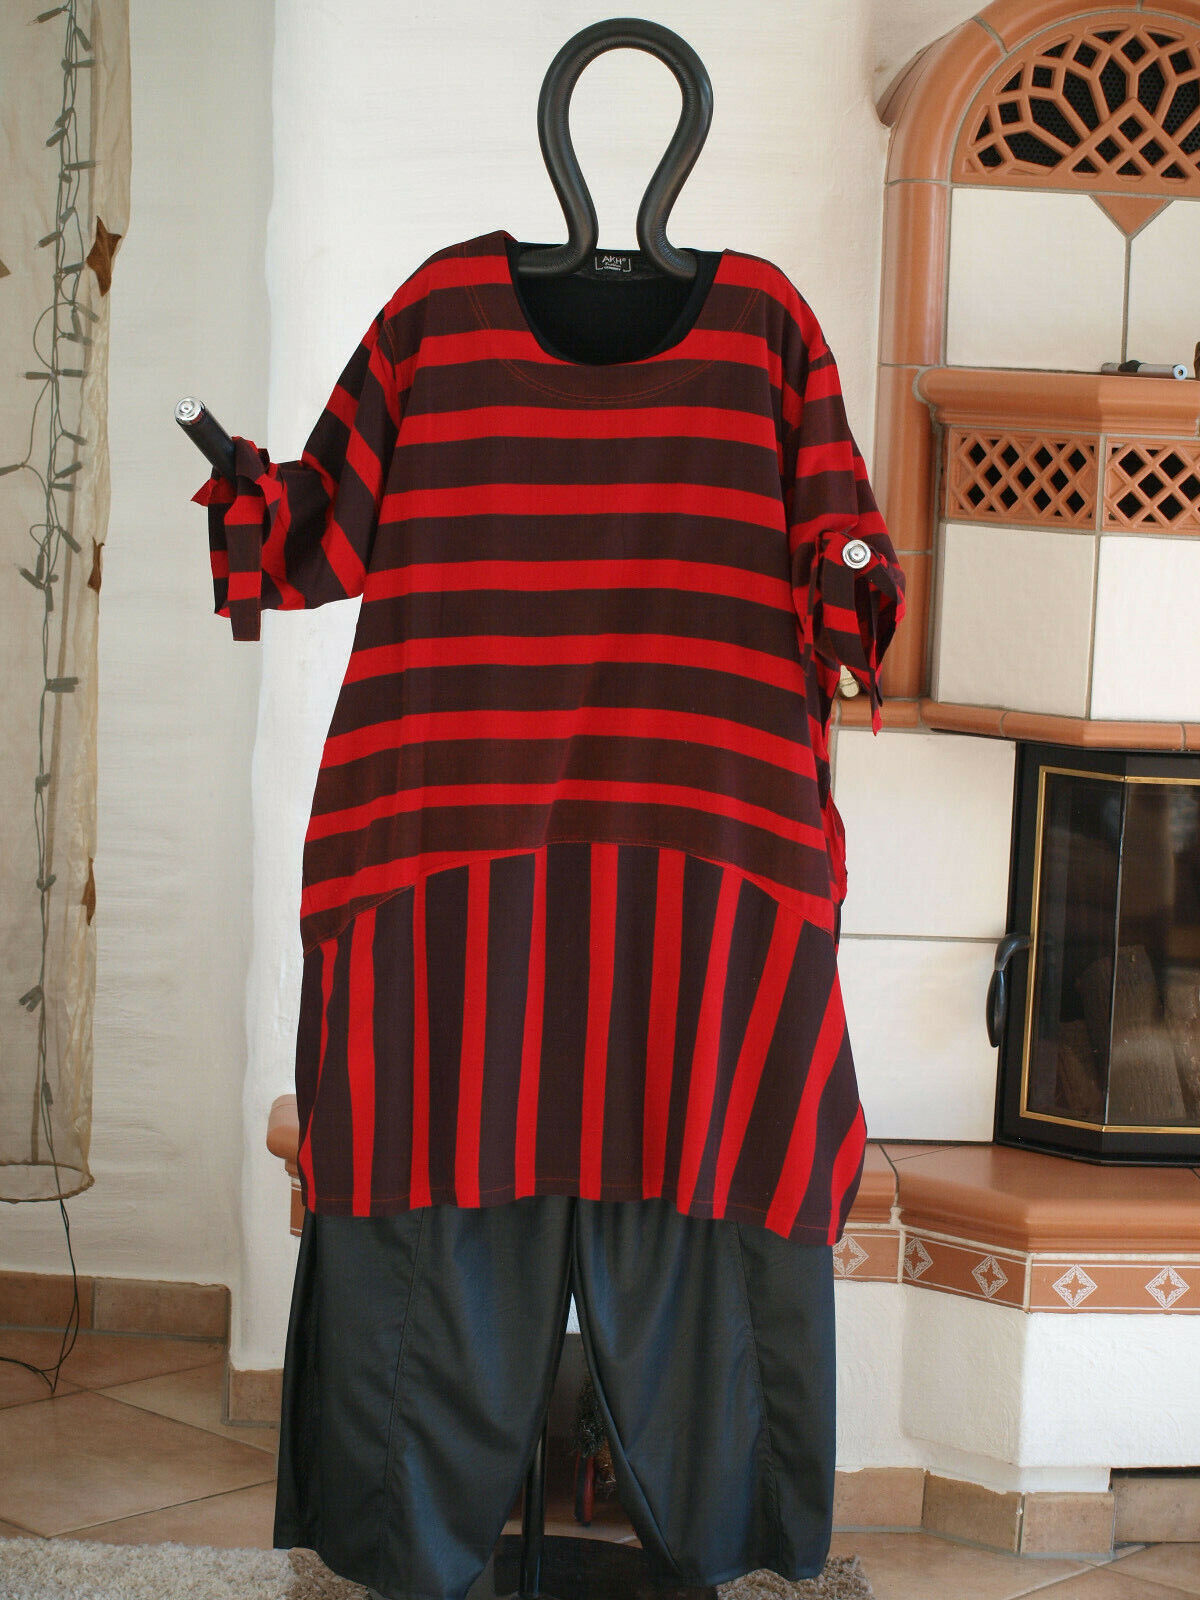 1840 LABASS Lagenlook Big Shirt Ballonform schwarz rot gestreift Gr. XXL 52 54